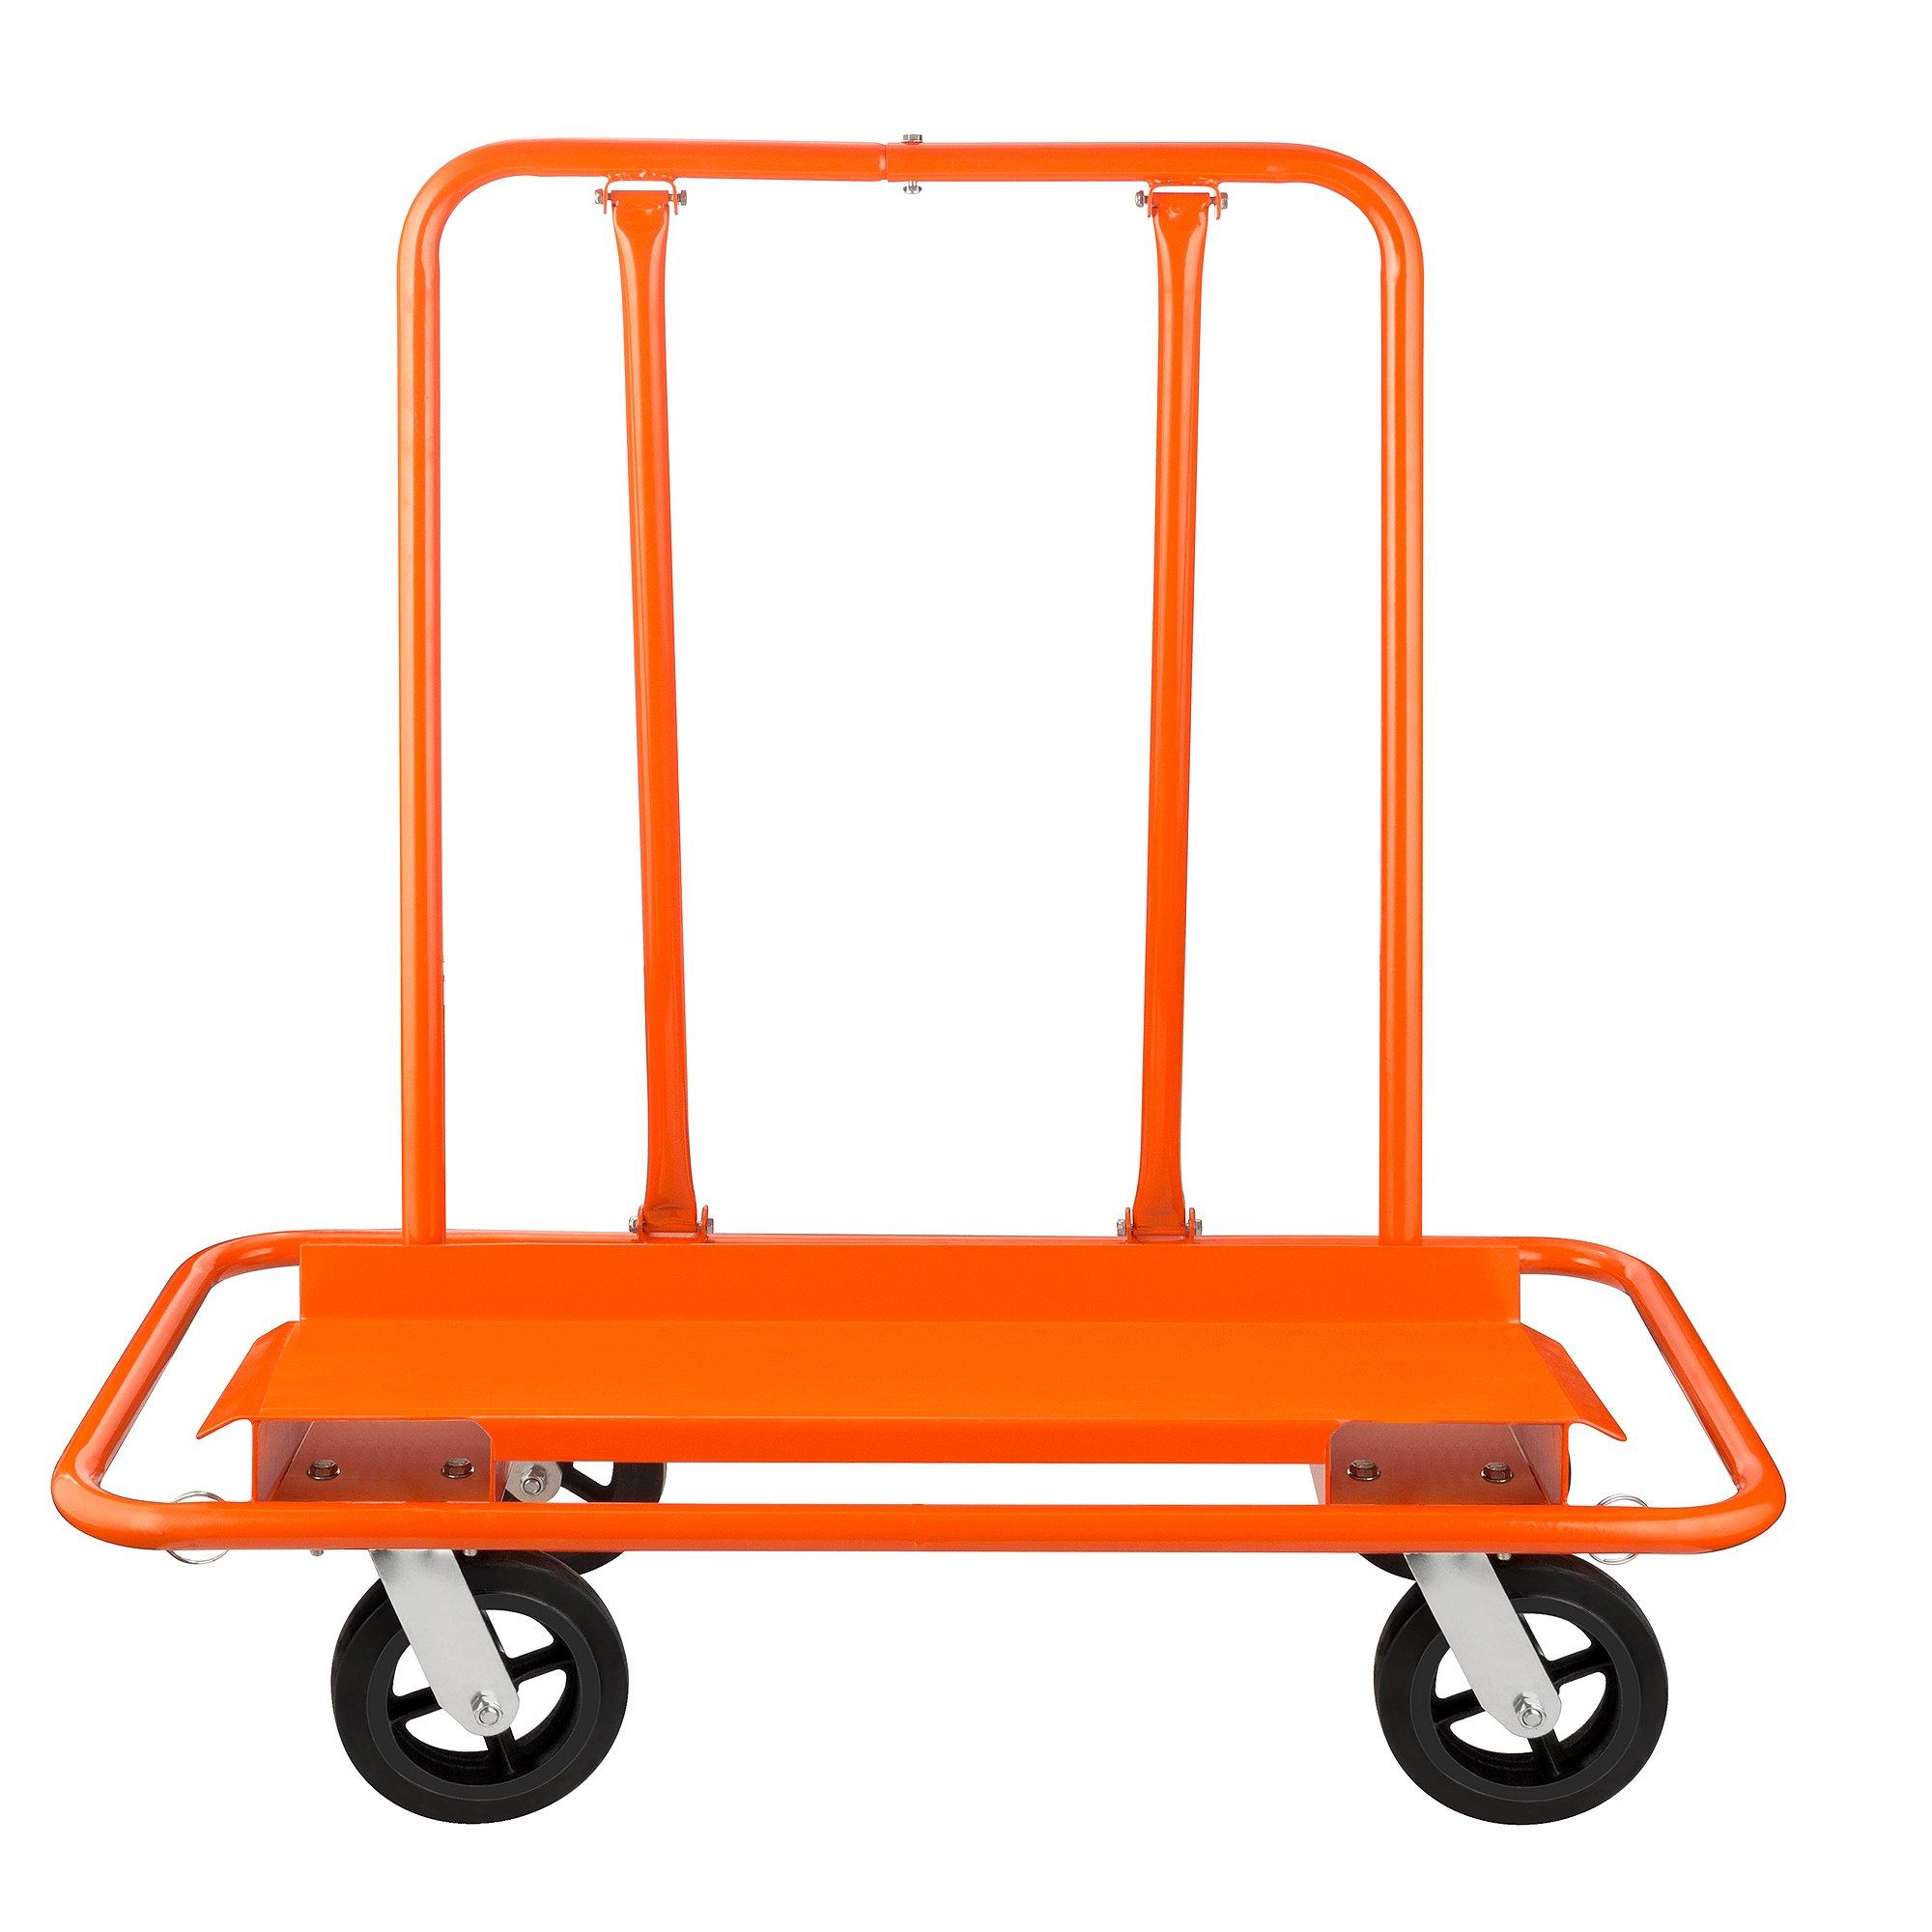 Pentagon Tools 6115 Drywall Cart